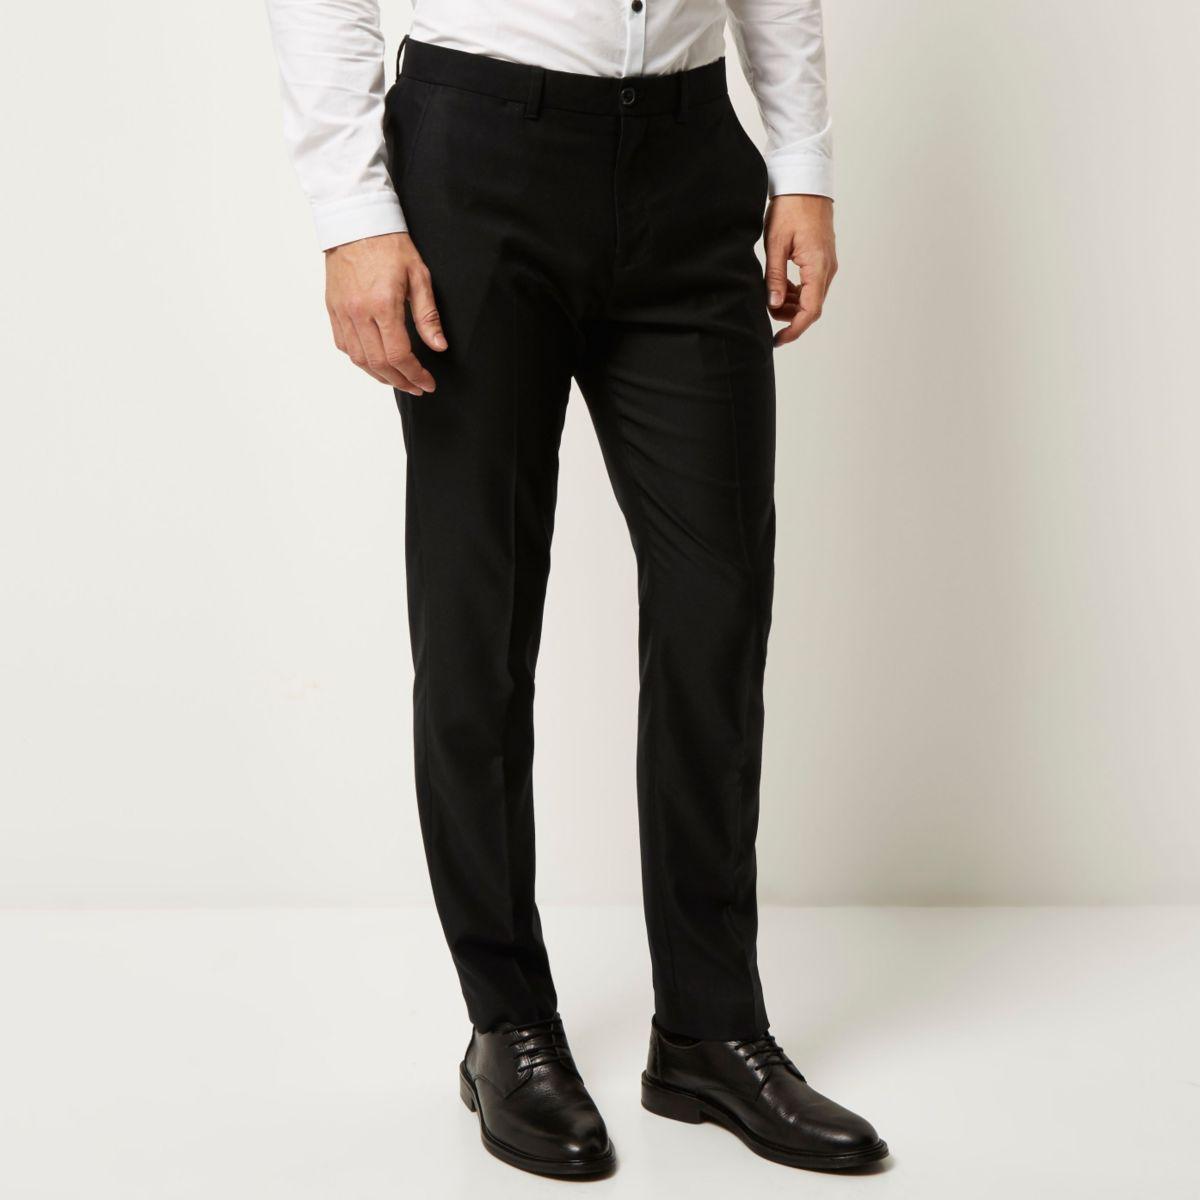 Black smart slim pants